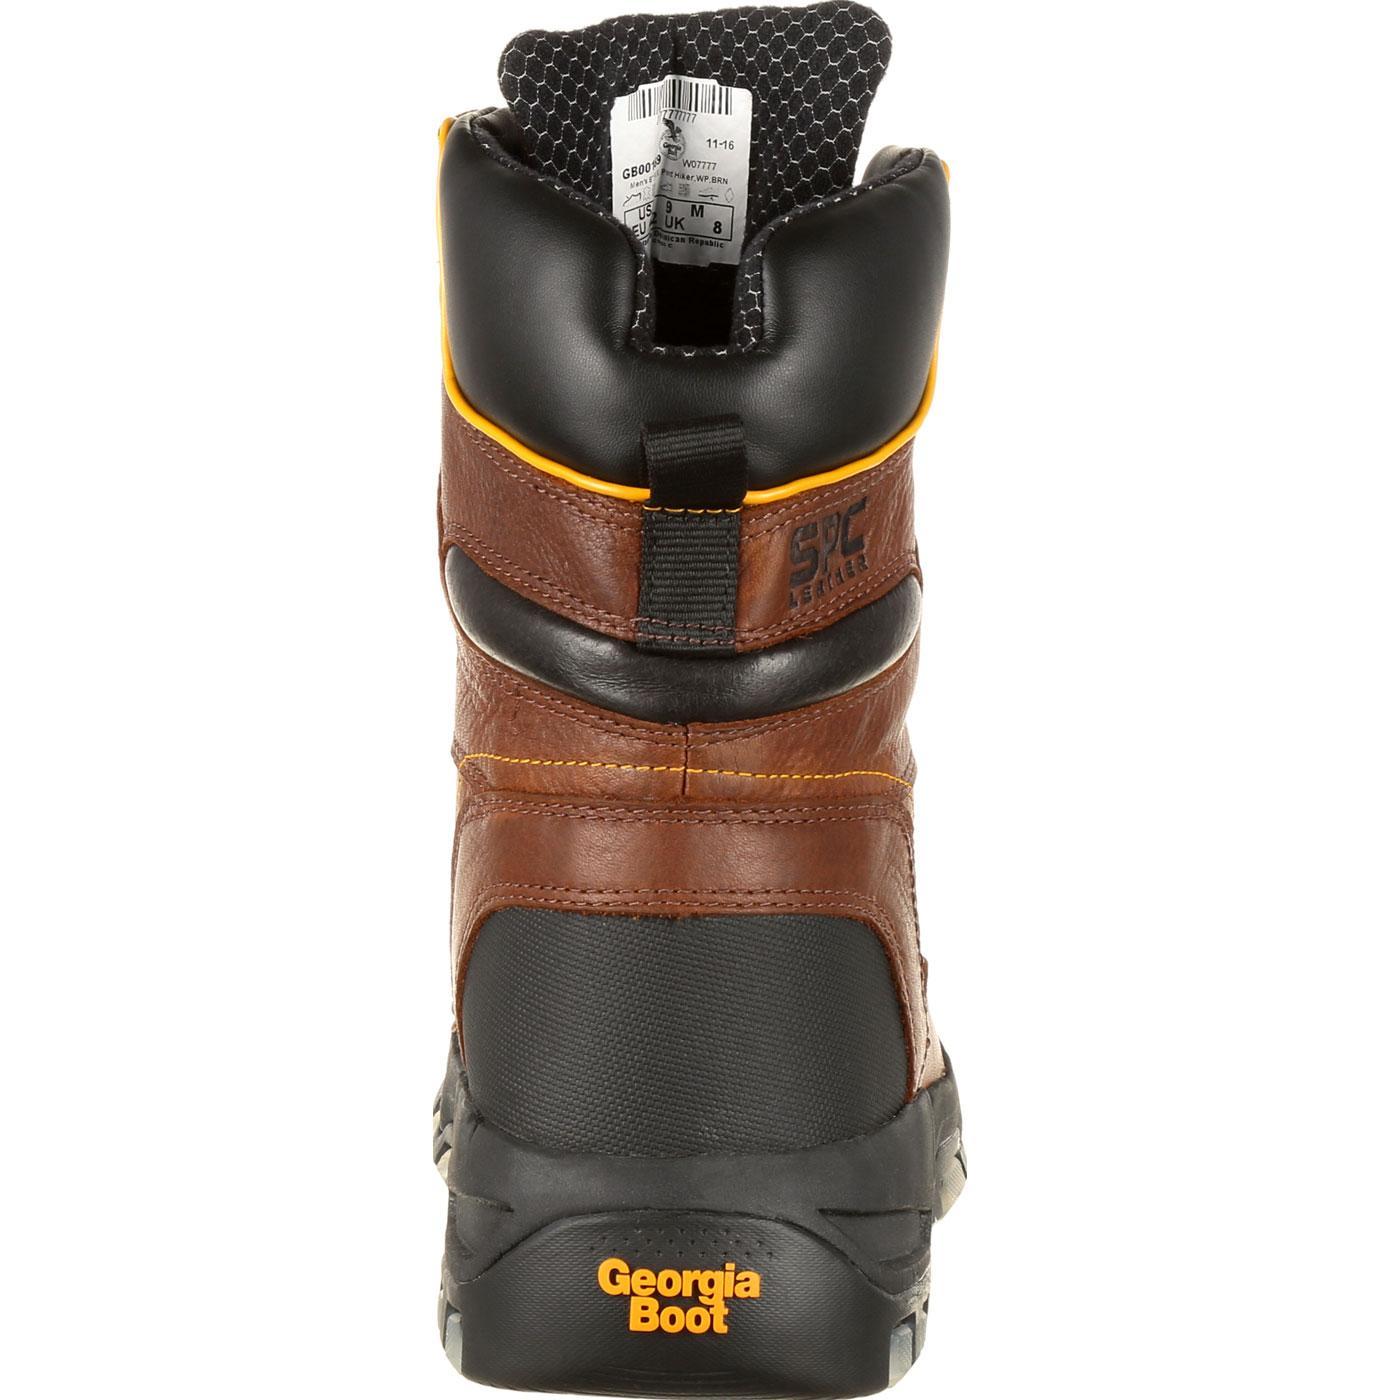 816c7e190f887 Georgia Boot - Men s FLXpoint Waterproof Boot